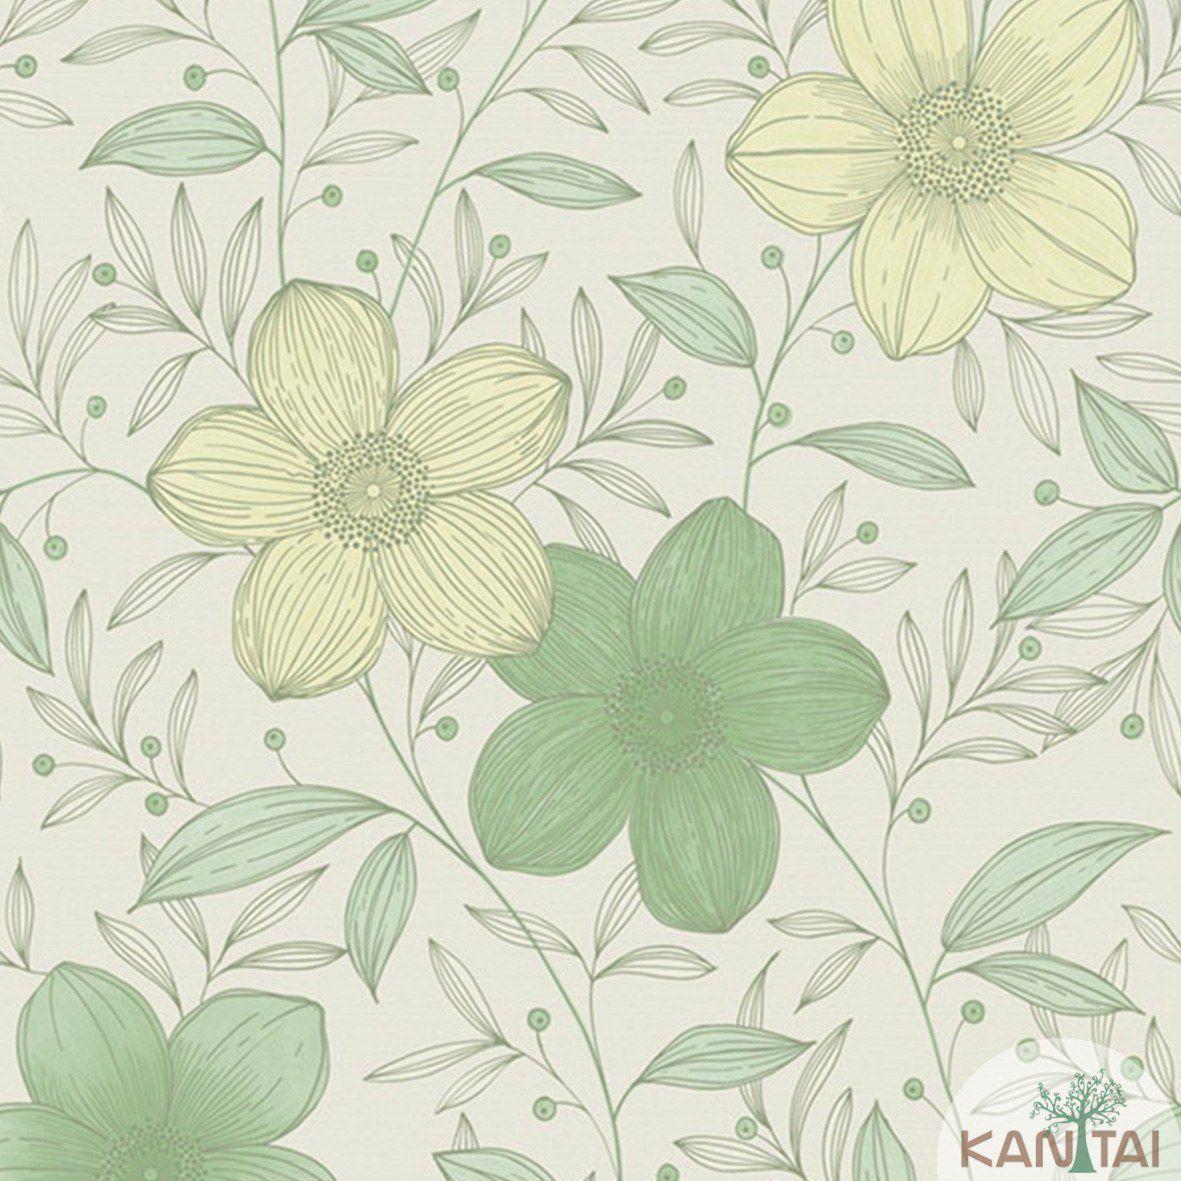 Papel de Parede   Kan Tai Vinilico Coleção Style Floral Creme, Verde, Amarelo